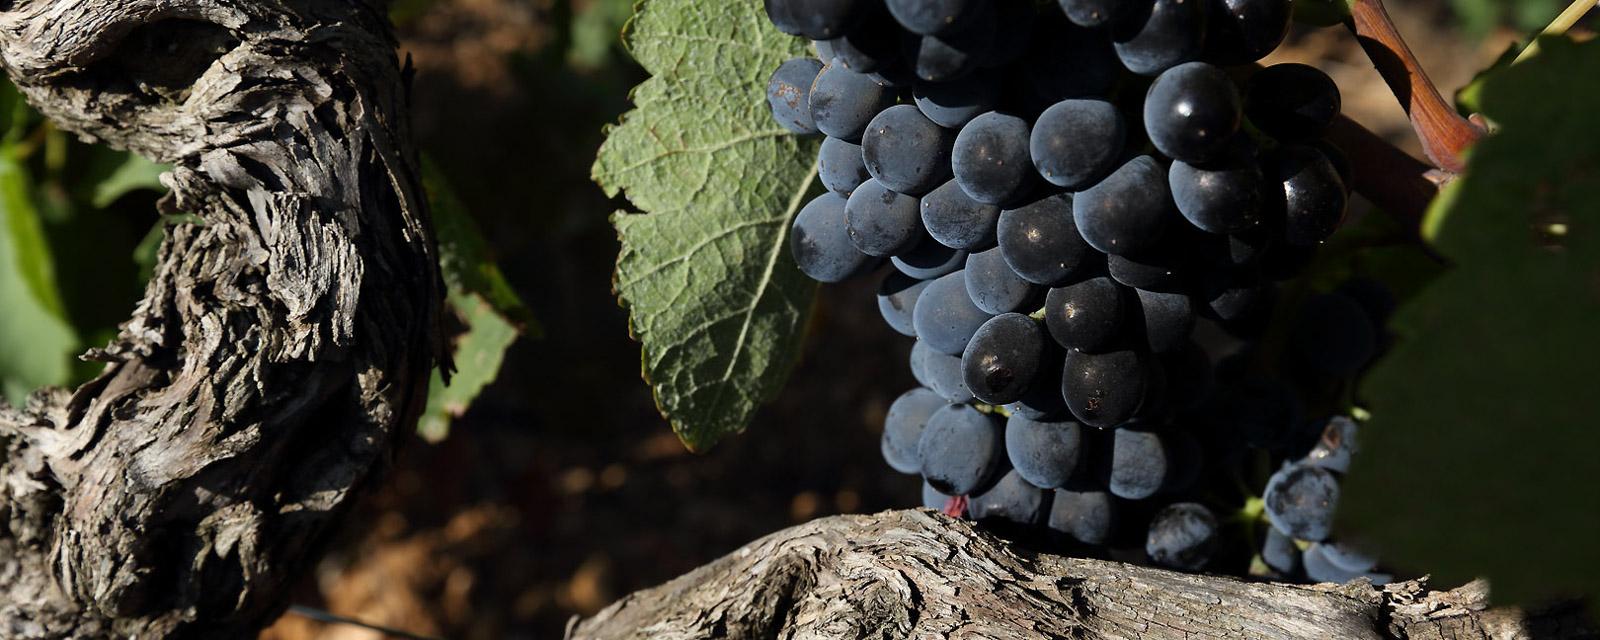 raisins noir 01